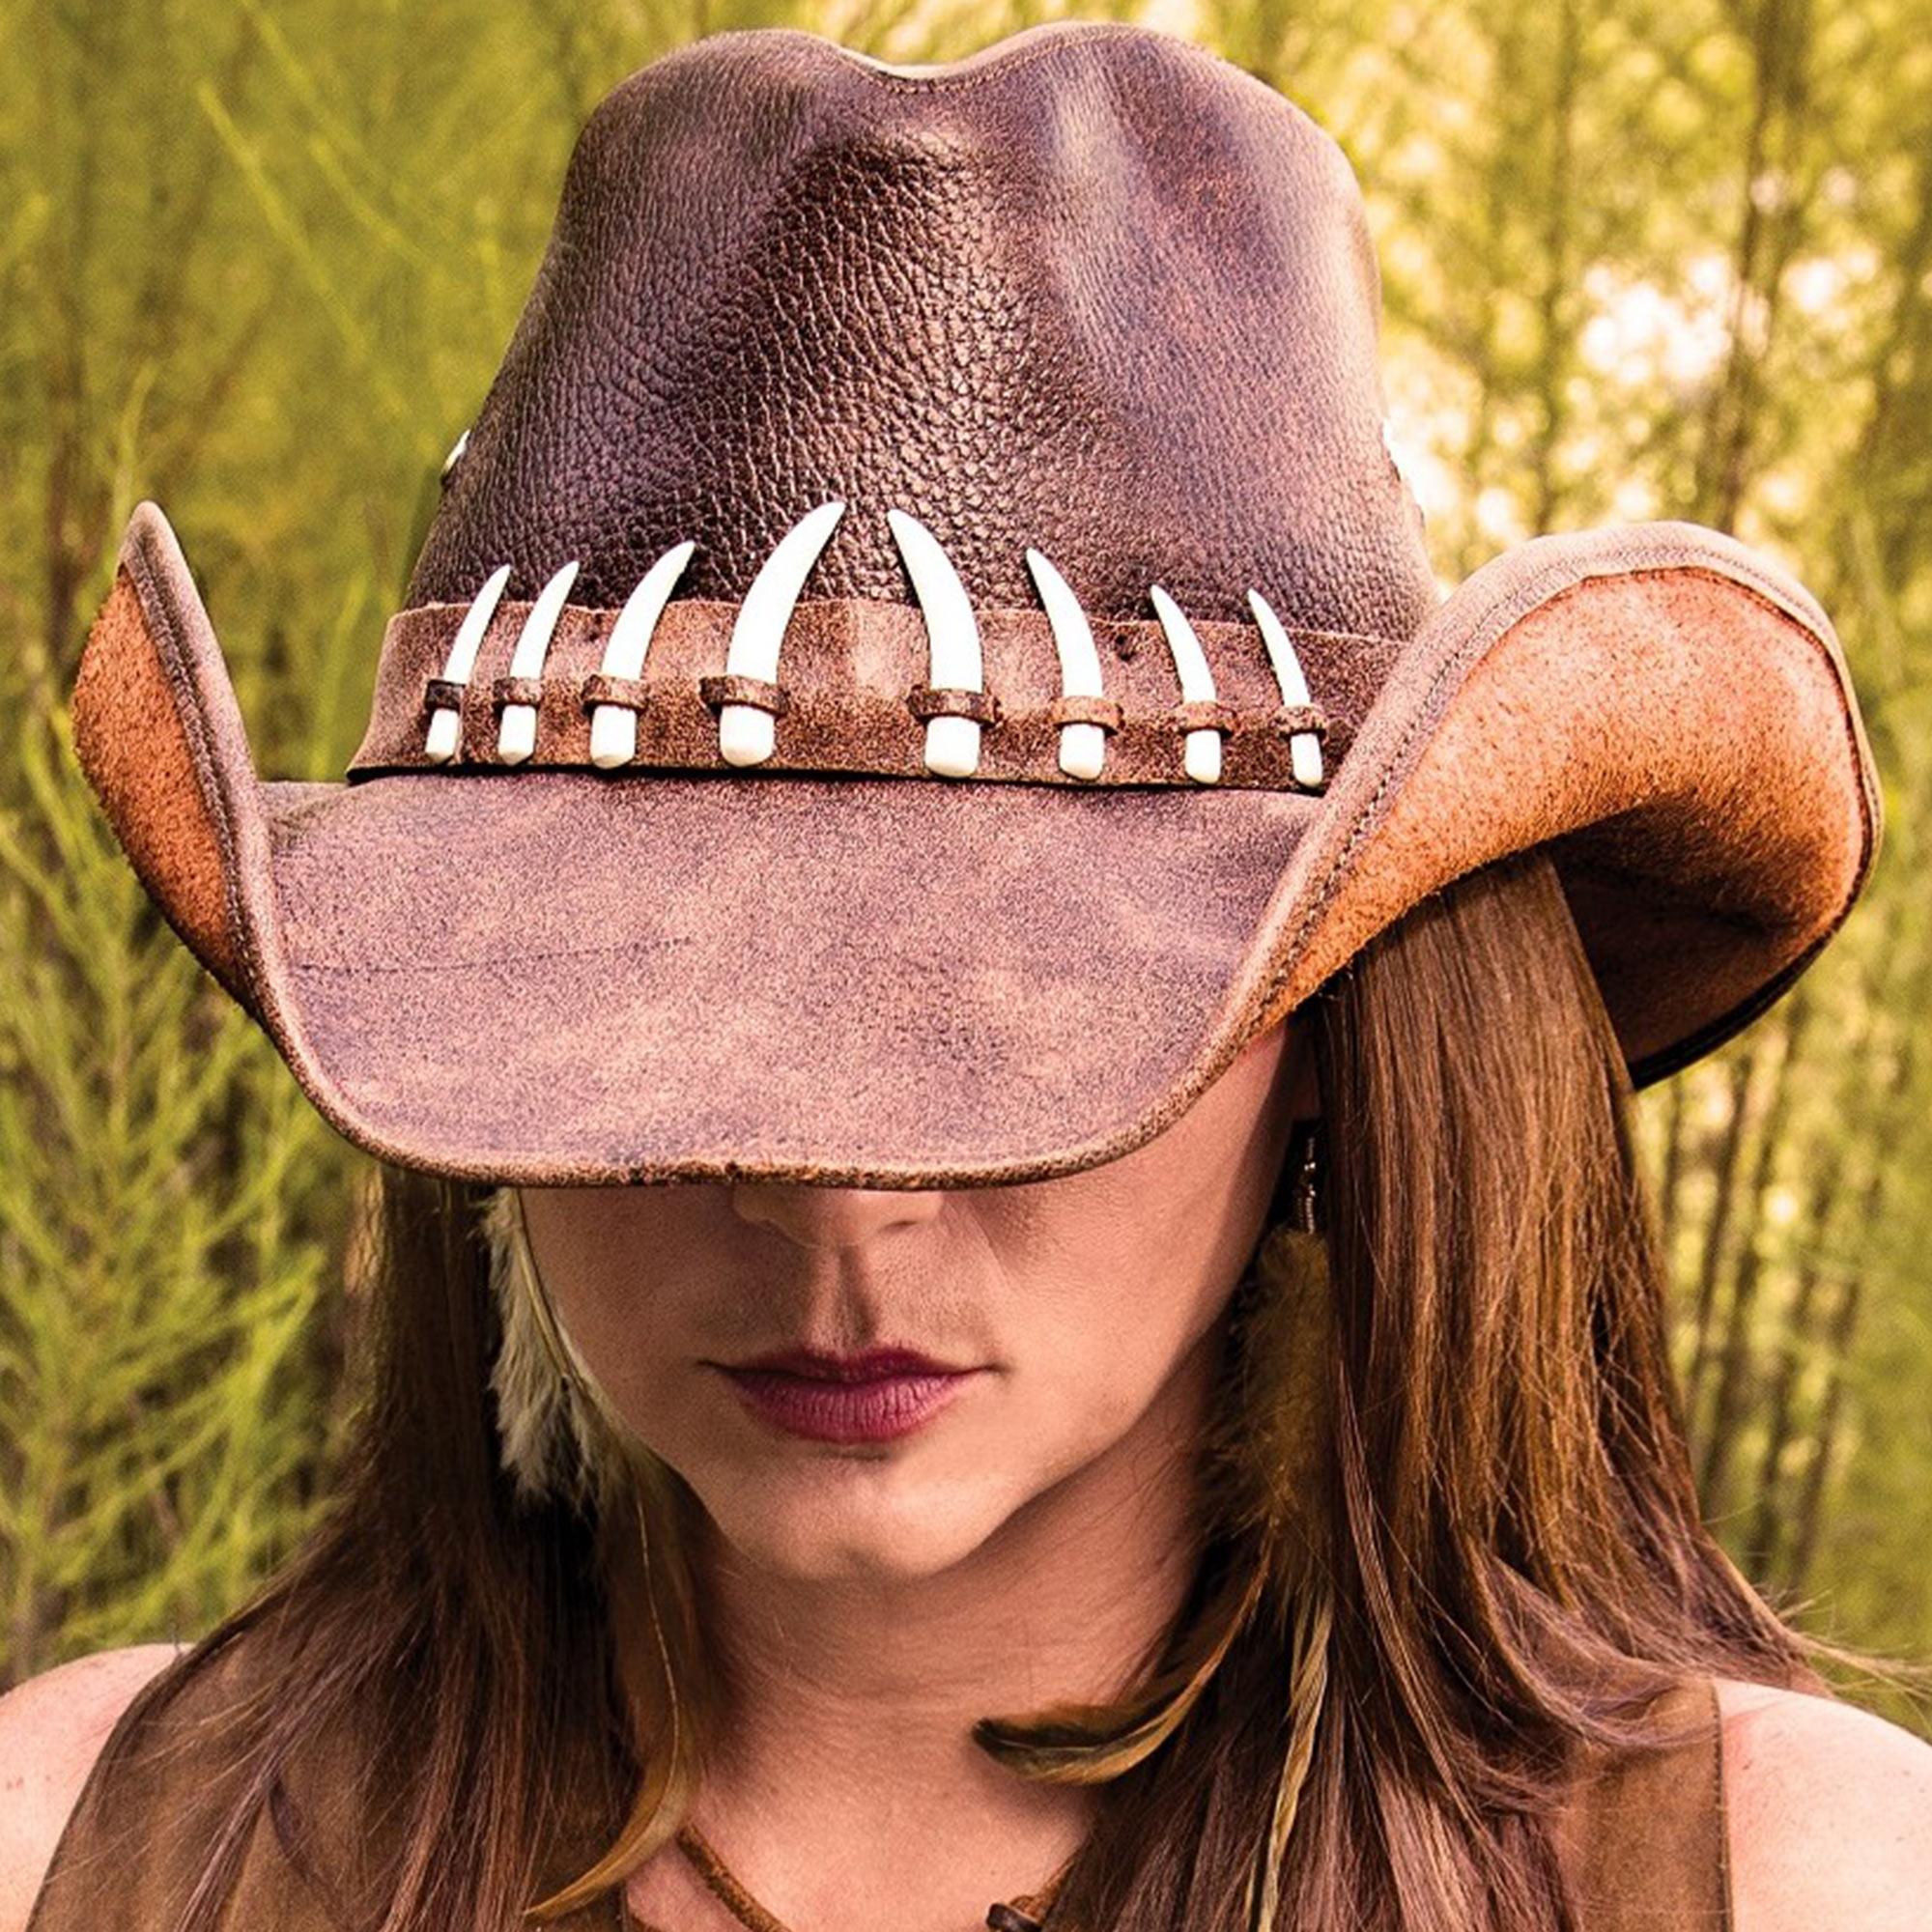 Outback Crocodile Survivor Hat - Genuine Weathered Leather, Shapeable Brim,  Faux Crocodile Teeth Accents, Inside Elastic Band